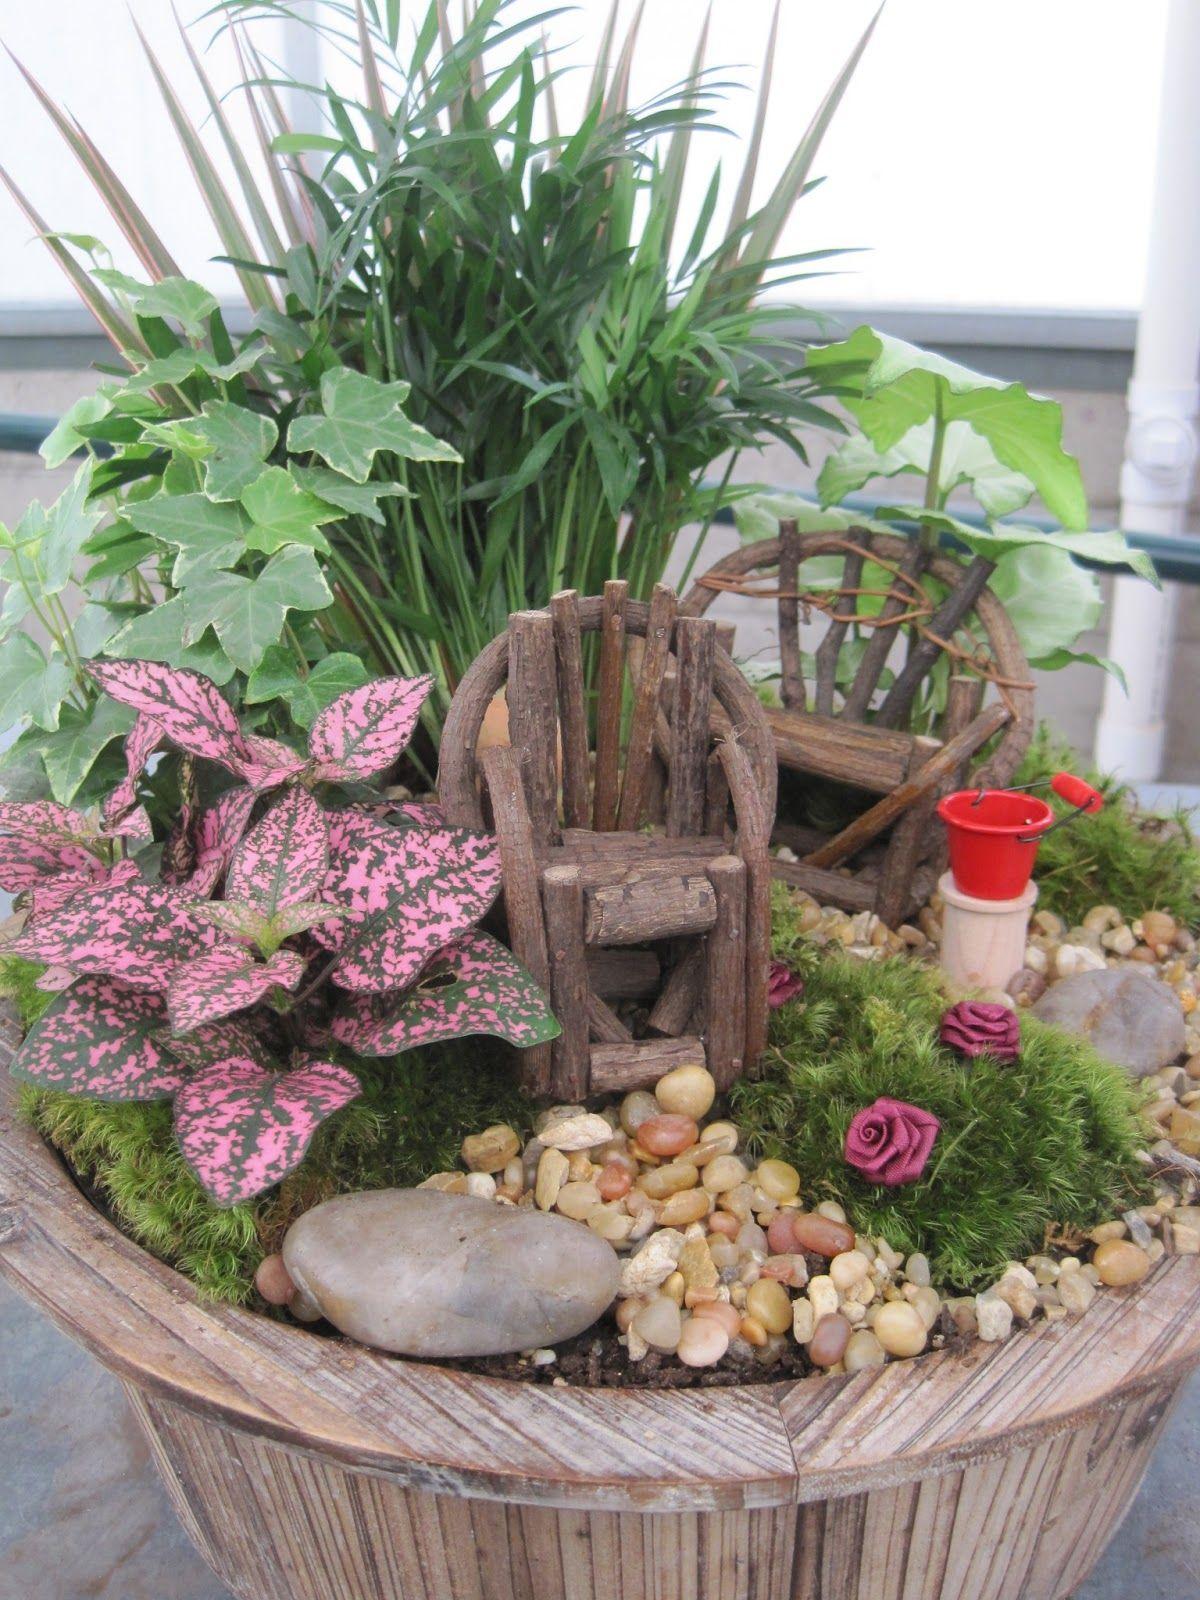 Miniature fairy gardens plants plants flowers and such - Miniature plants for fairy gardens ...